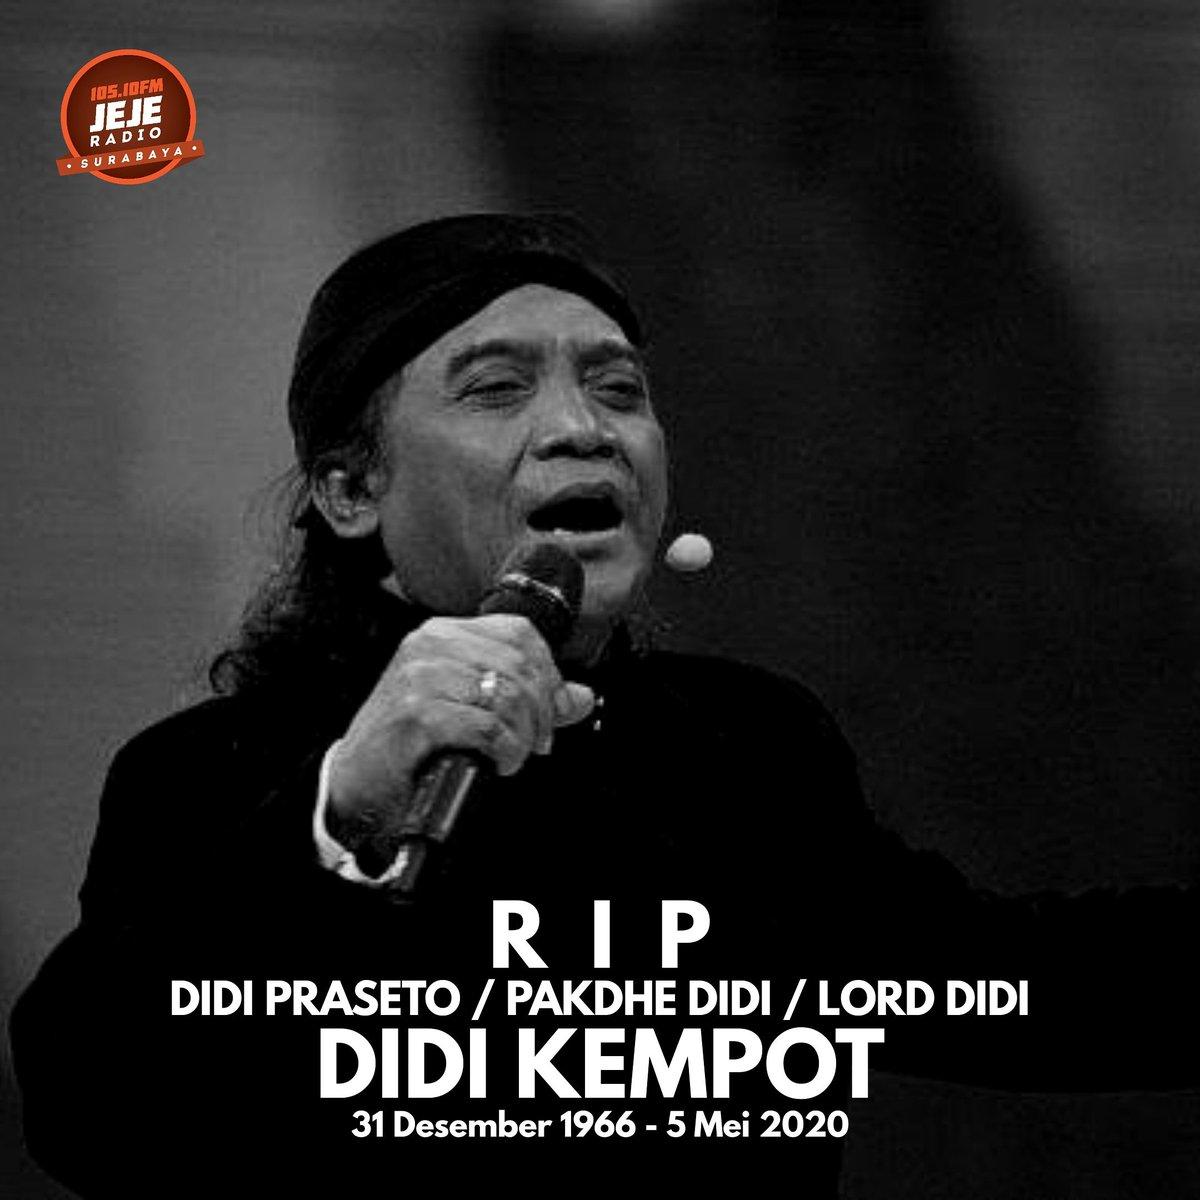 Jeje Radio Surabaya On Twitter Berduka Selamat Jalan Lord Didi